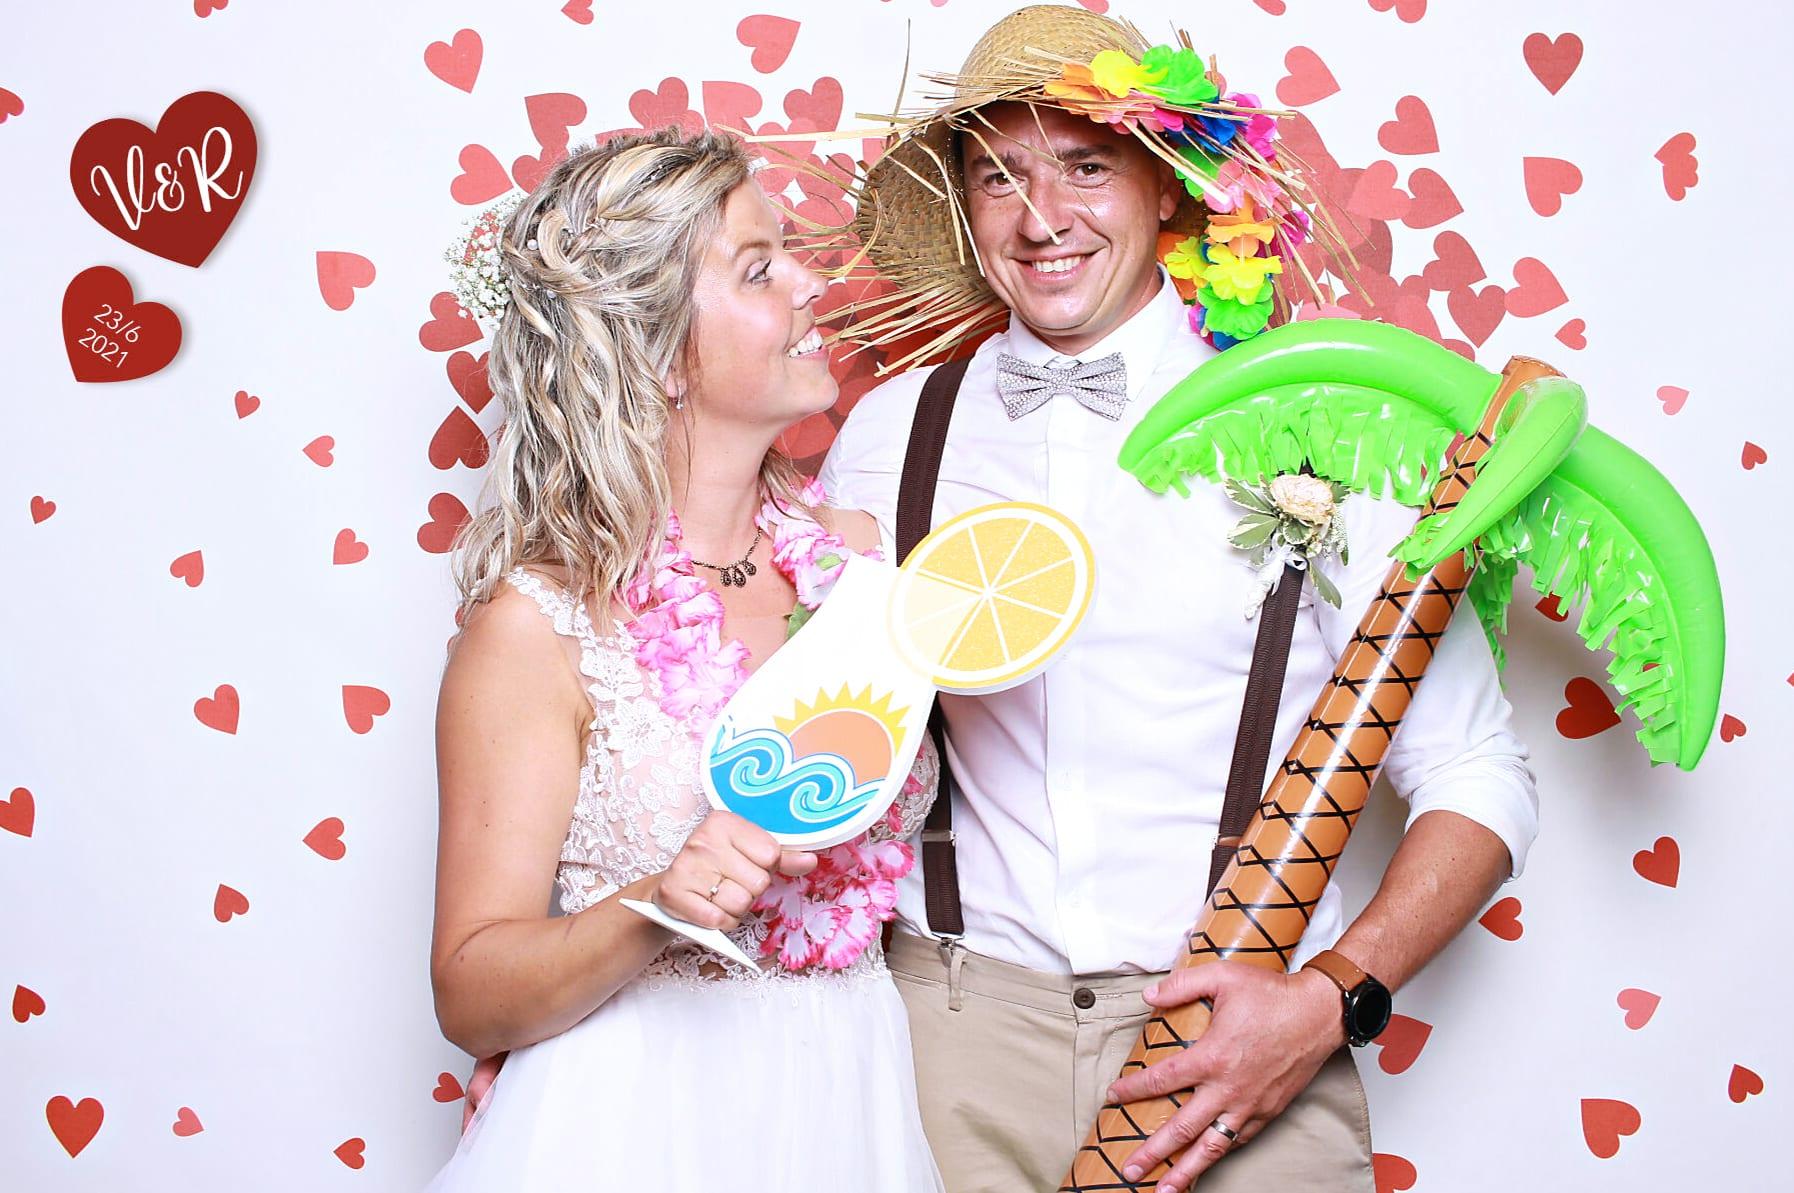 fotokoutek-svatba-vr-23-6-2021-734179